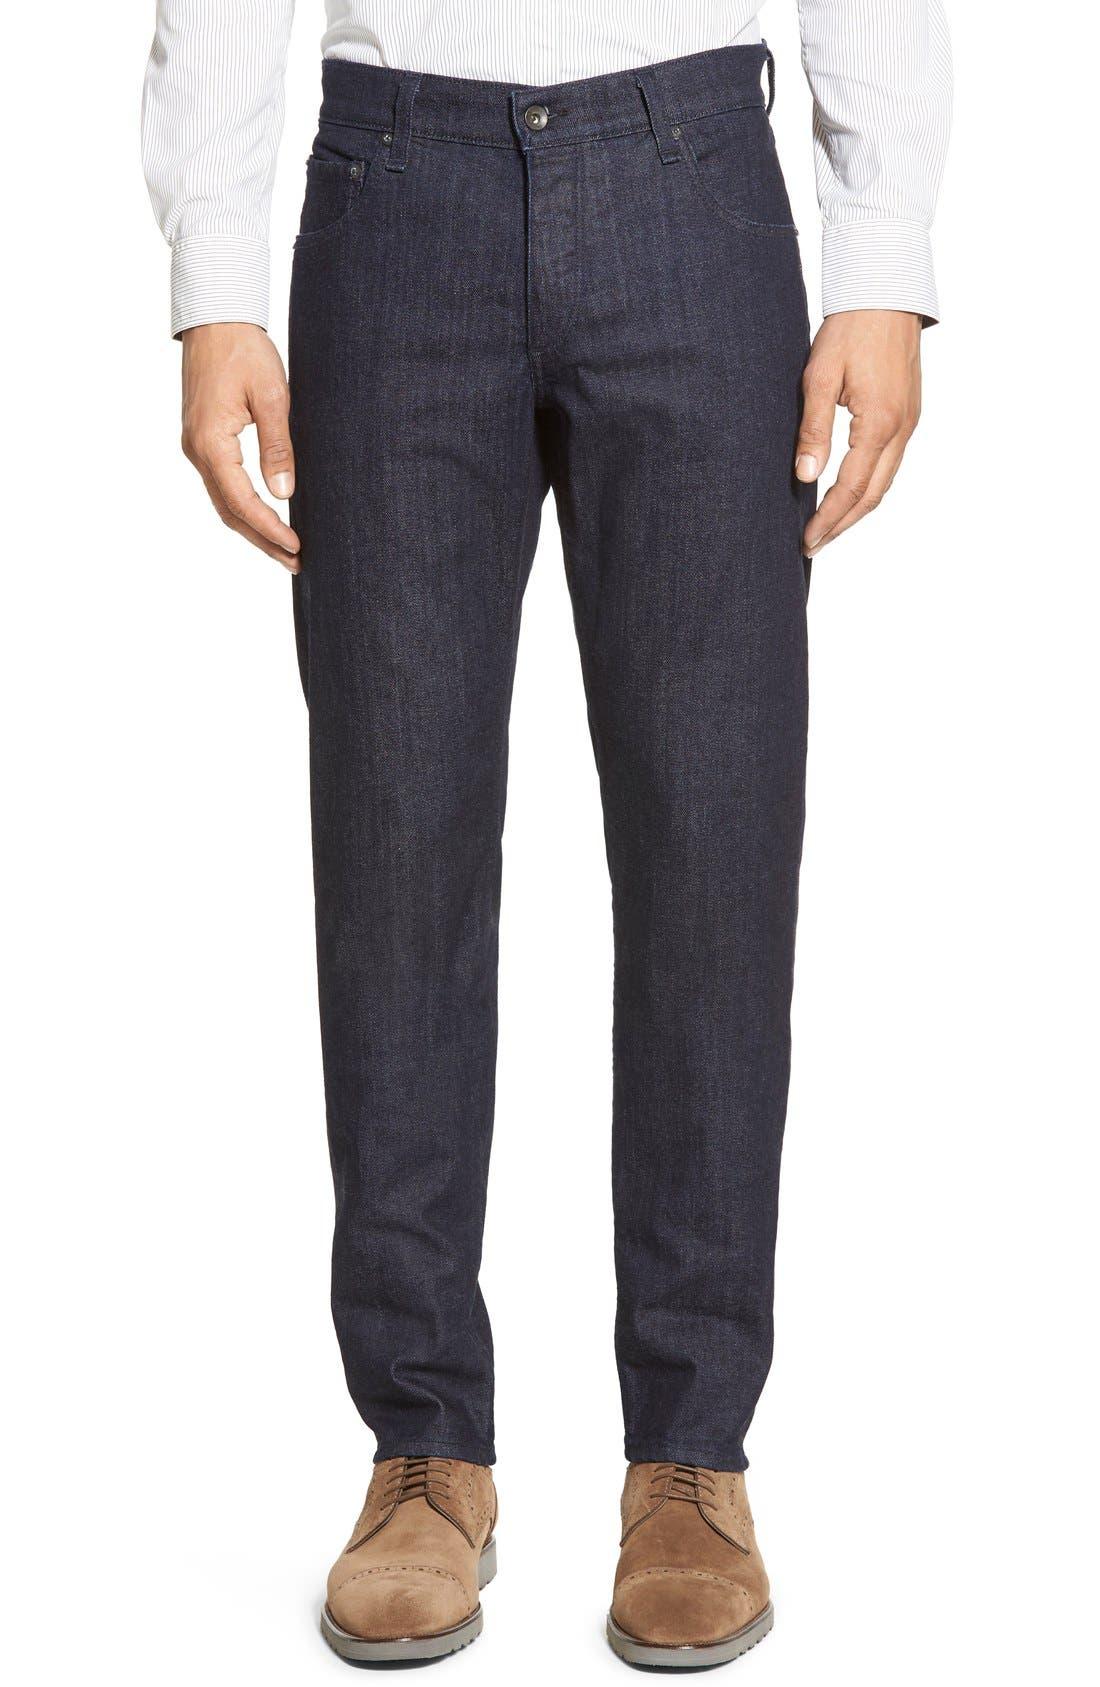 RAG & BONE, Standard Issue Fit 2 Slim Fit Jeans, Main thumbnail 1, color, TONAL RINSE